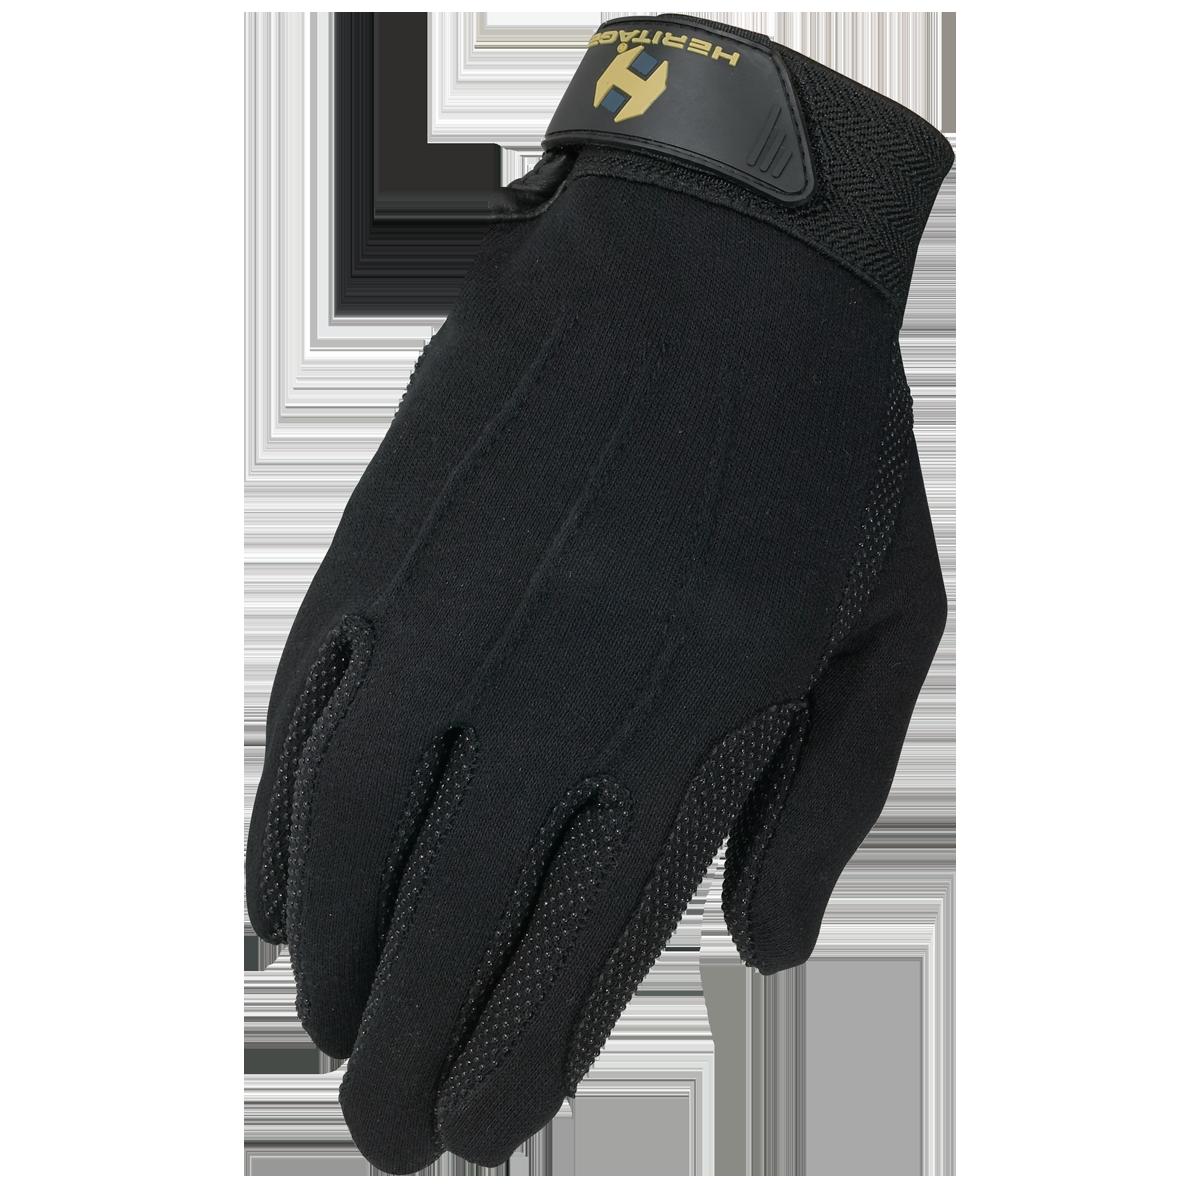 Heritage Heritage Cotton Grip Glove, Black